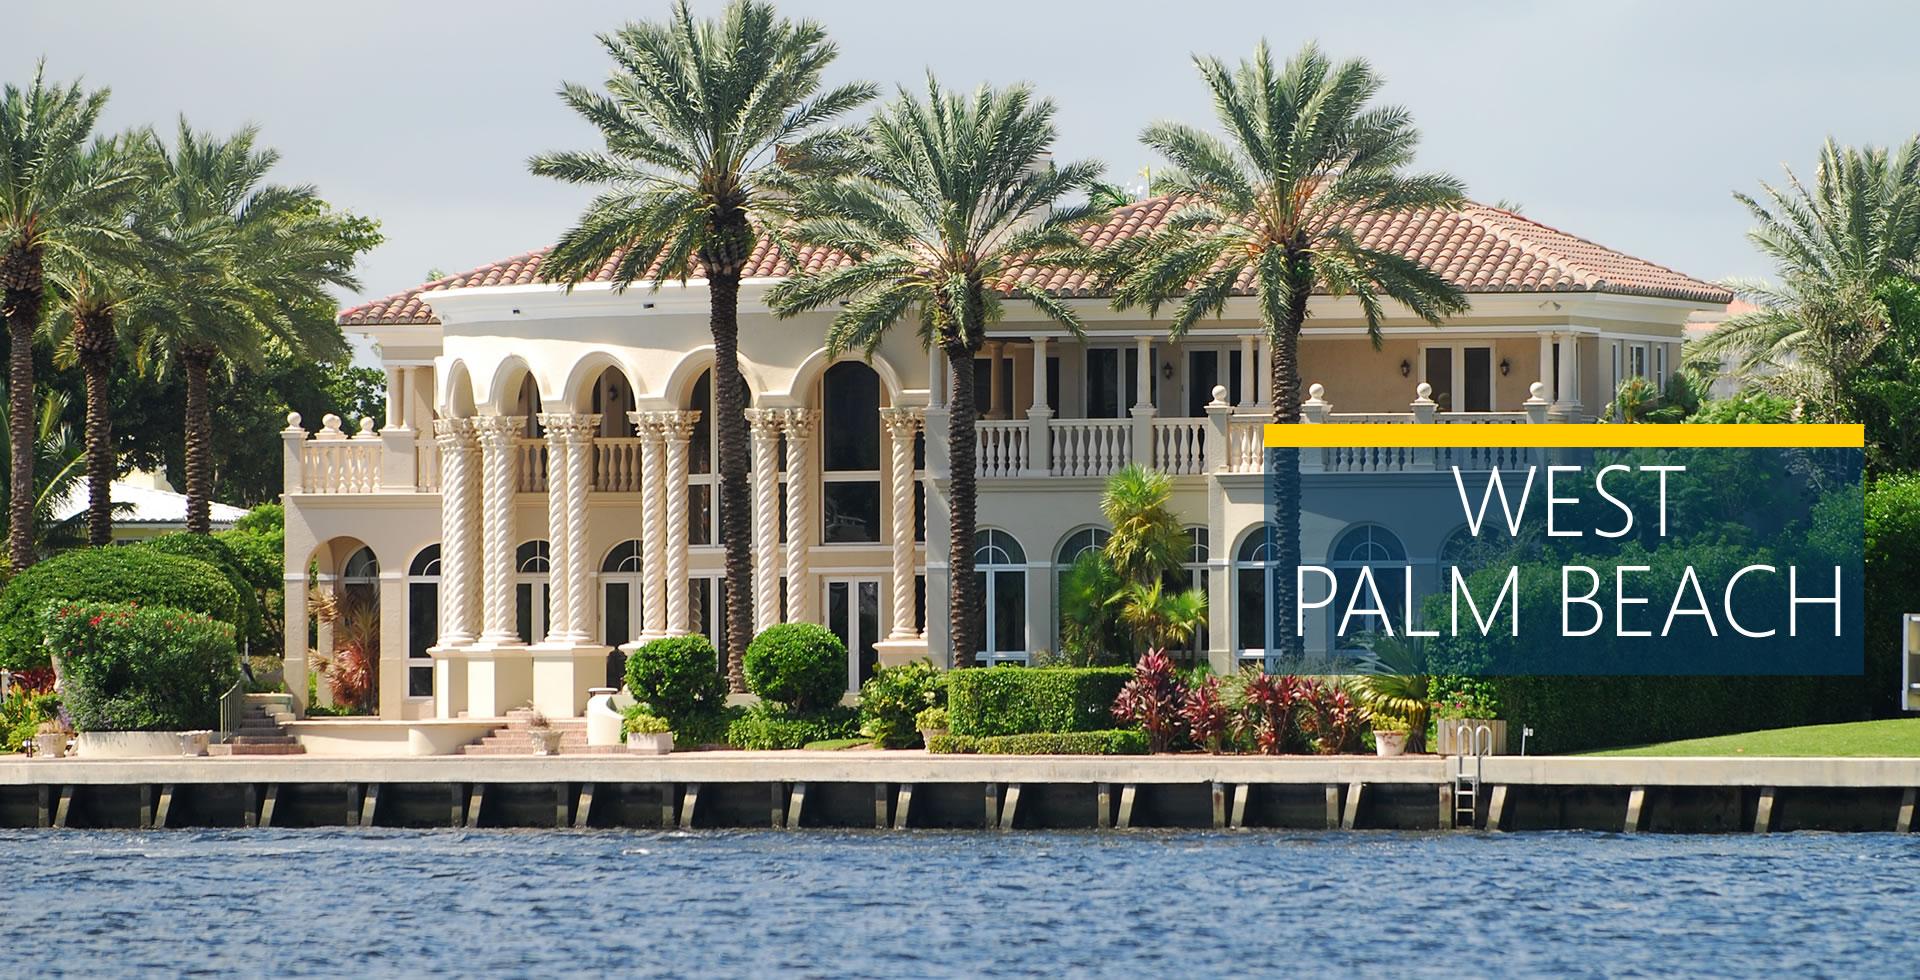 Roof Repair West Palm Beach Expert Residential